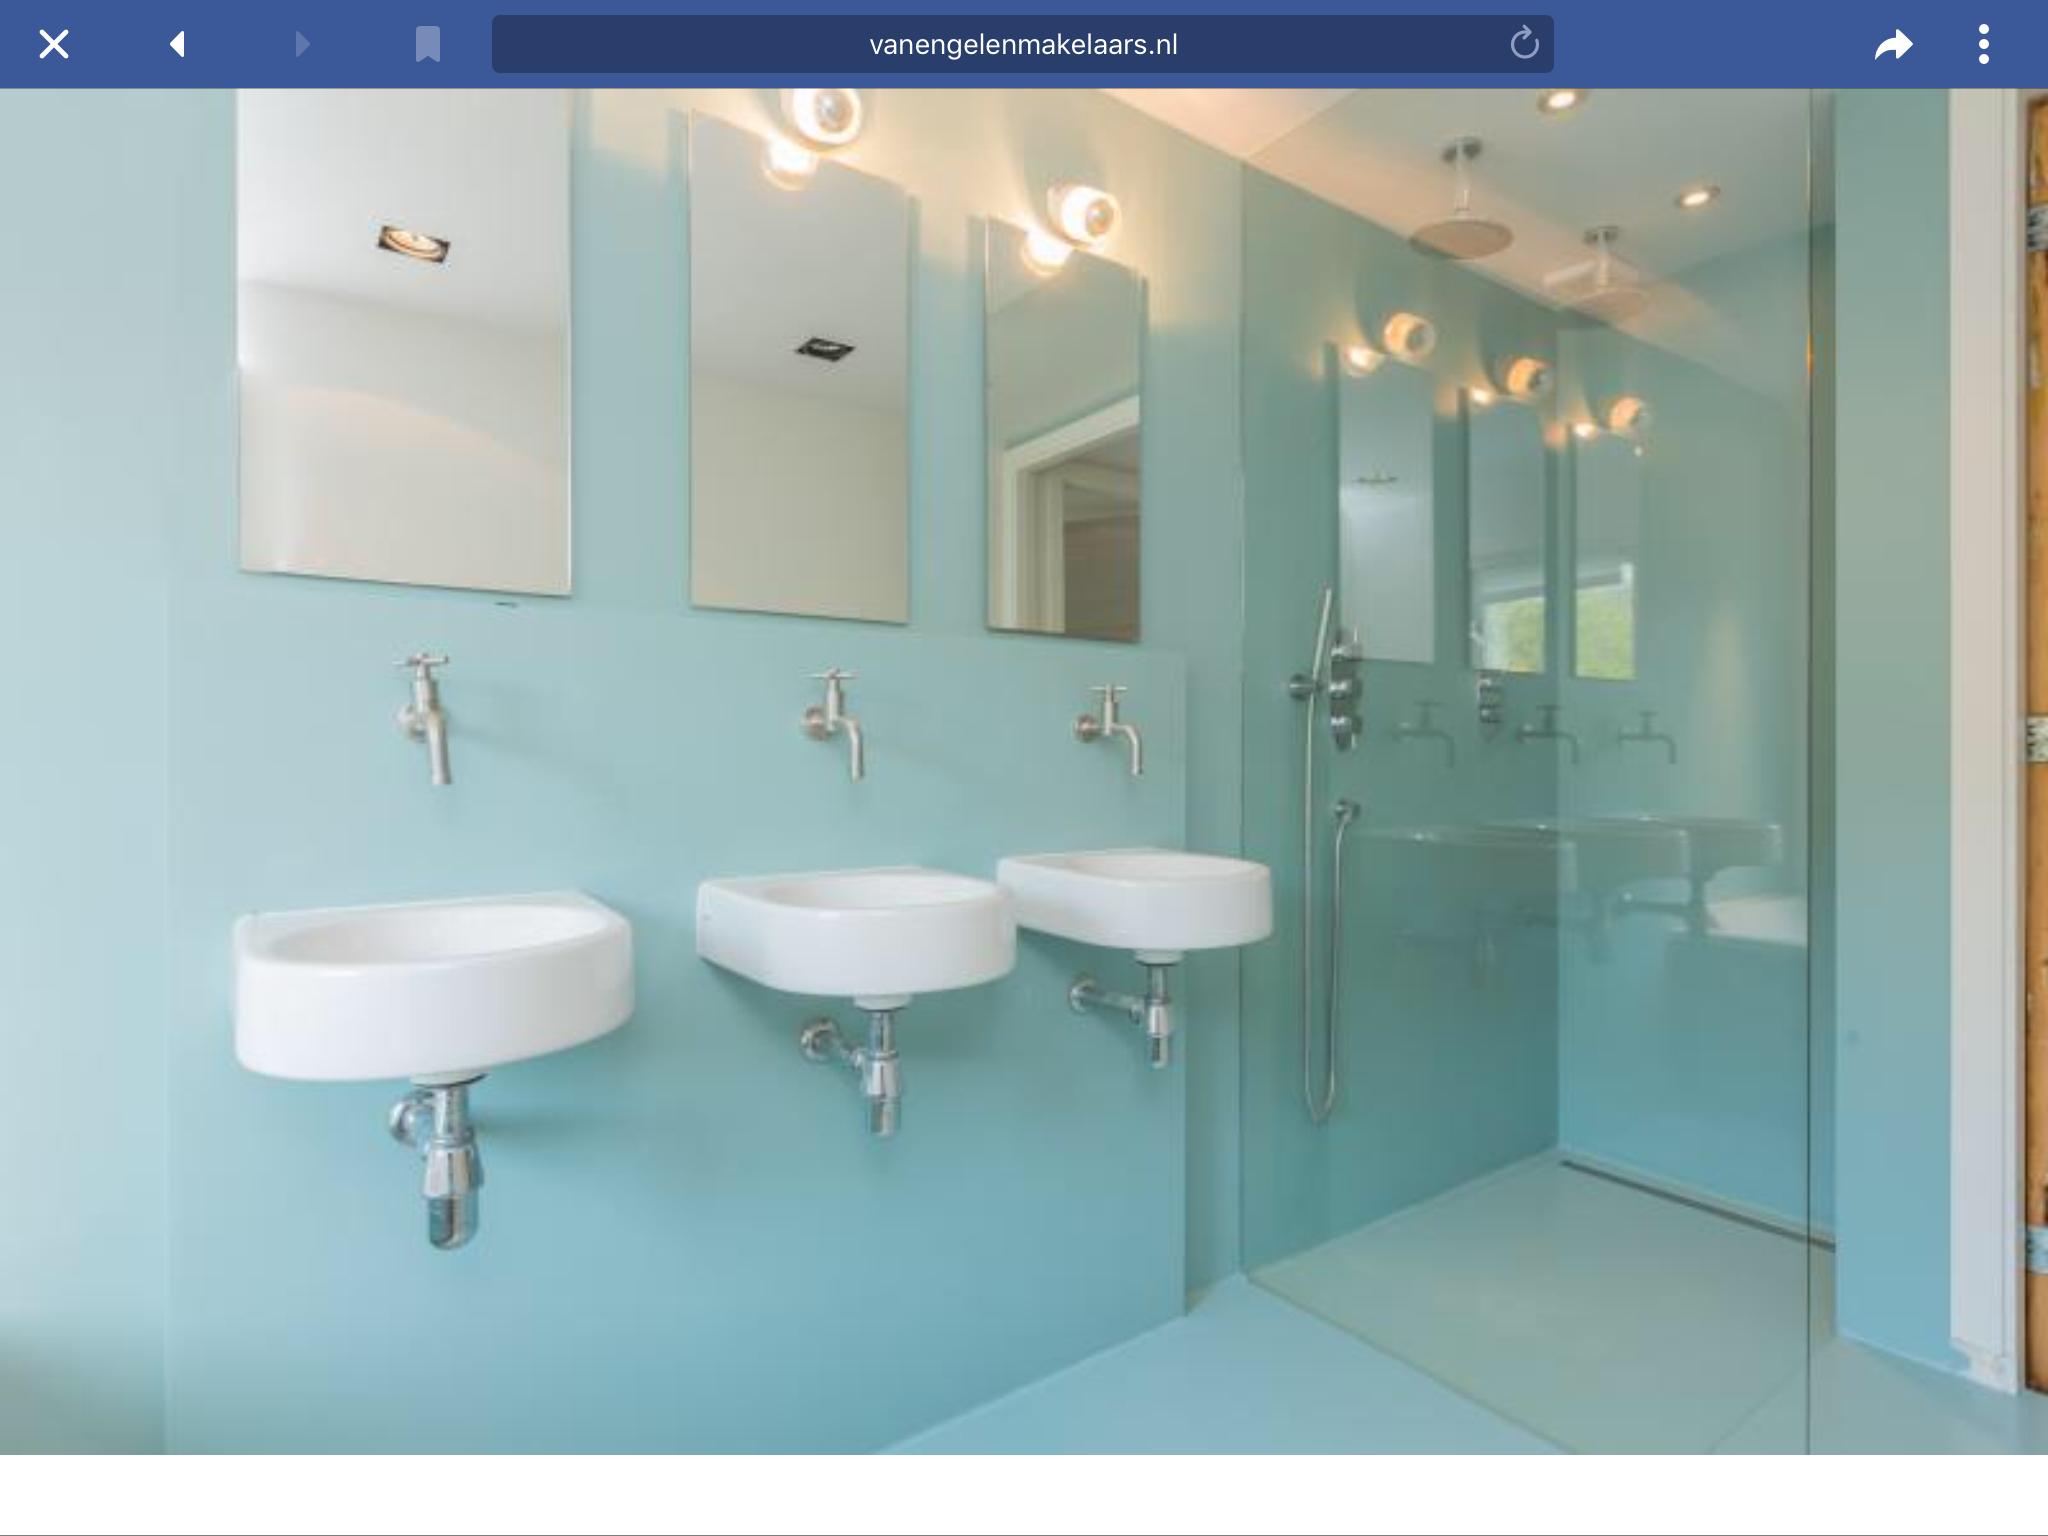 pin van harm balder op badkamer pinterest badkamer